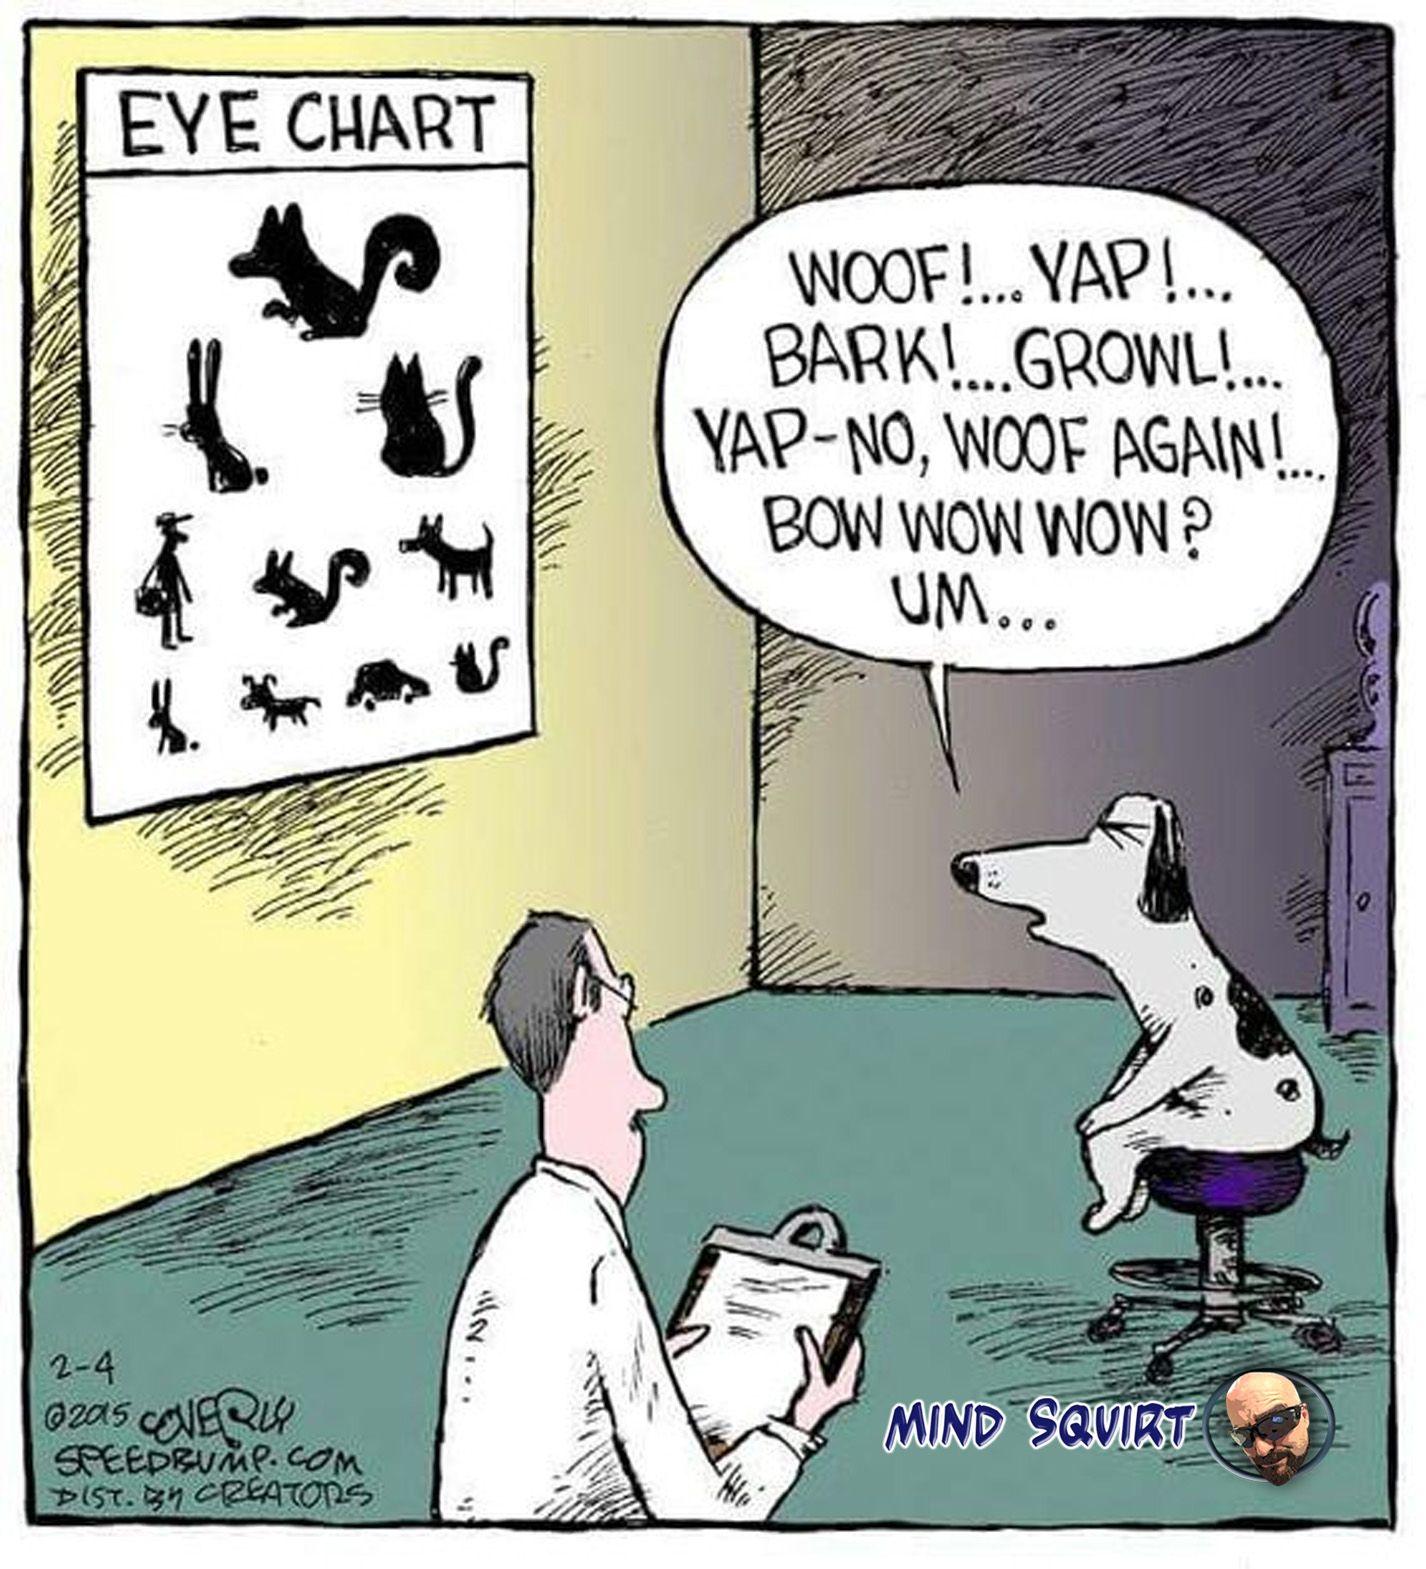 Pin By Barbara Mazzola On Cartoons Funny Cartoons Optometry Humor Speed Bump Comic